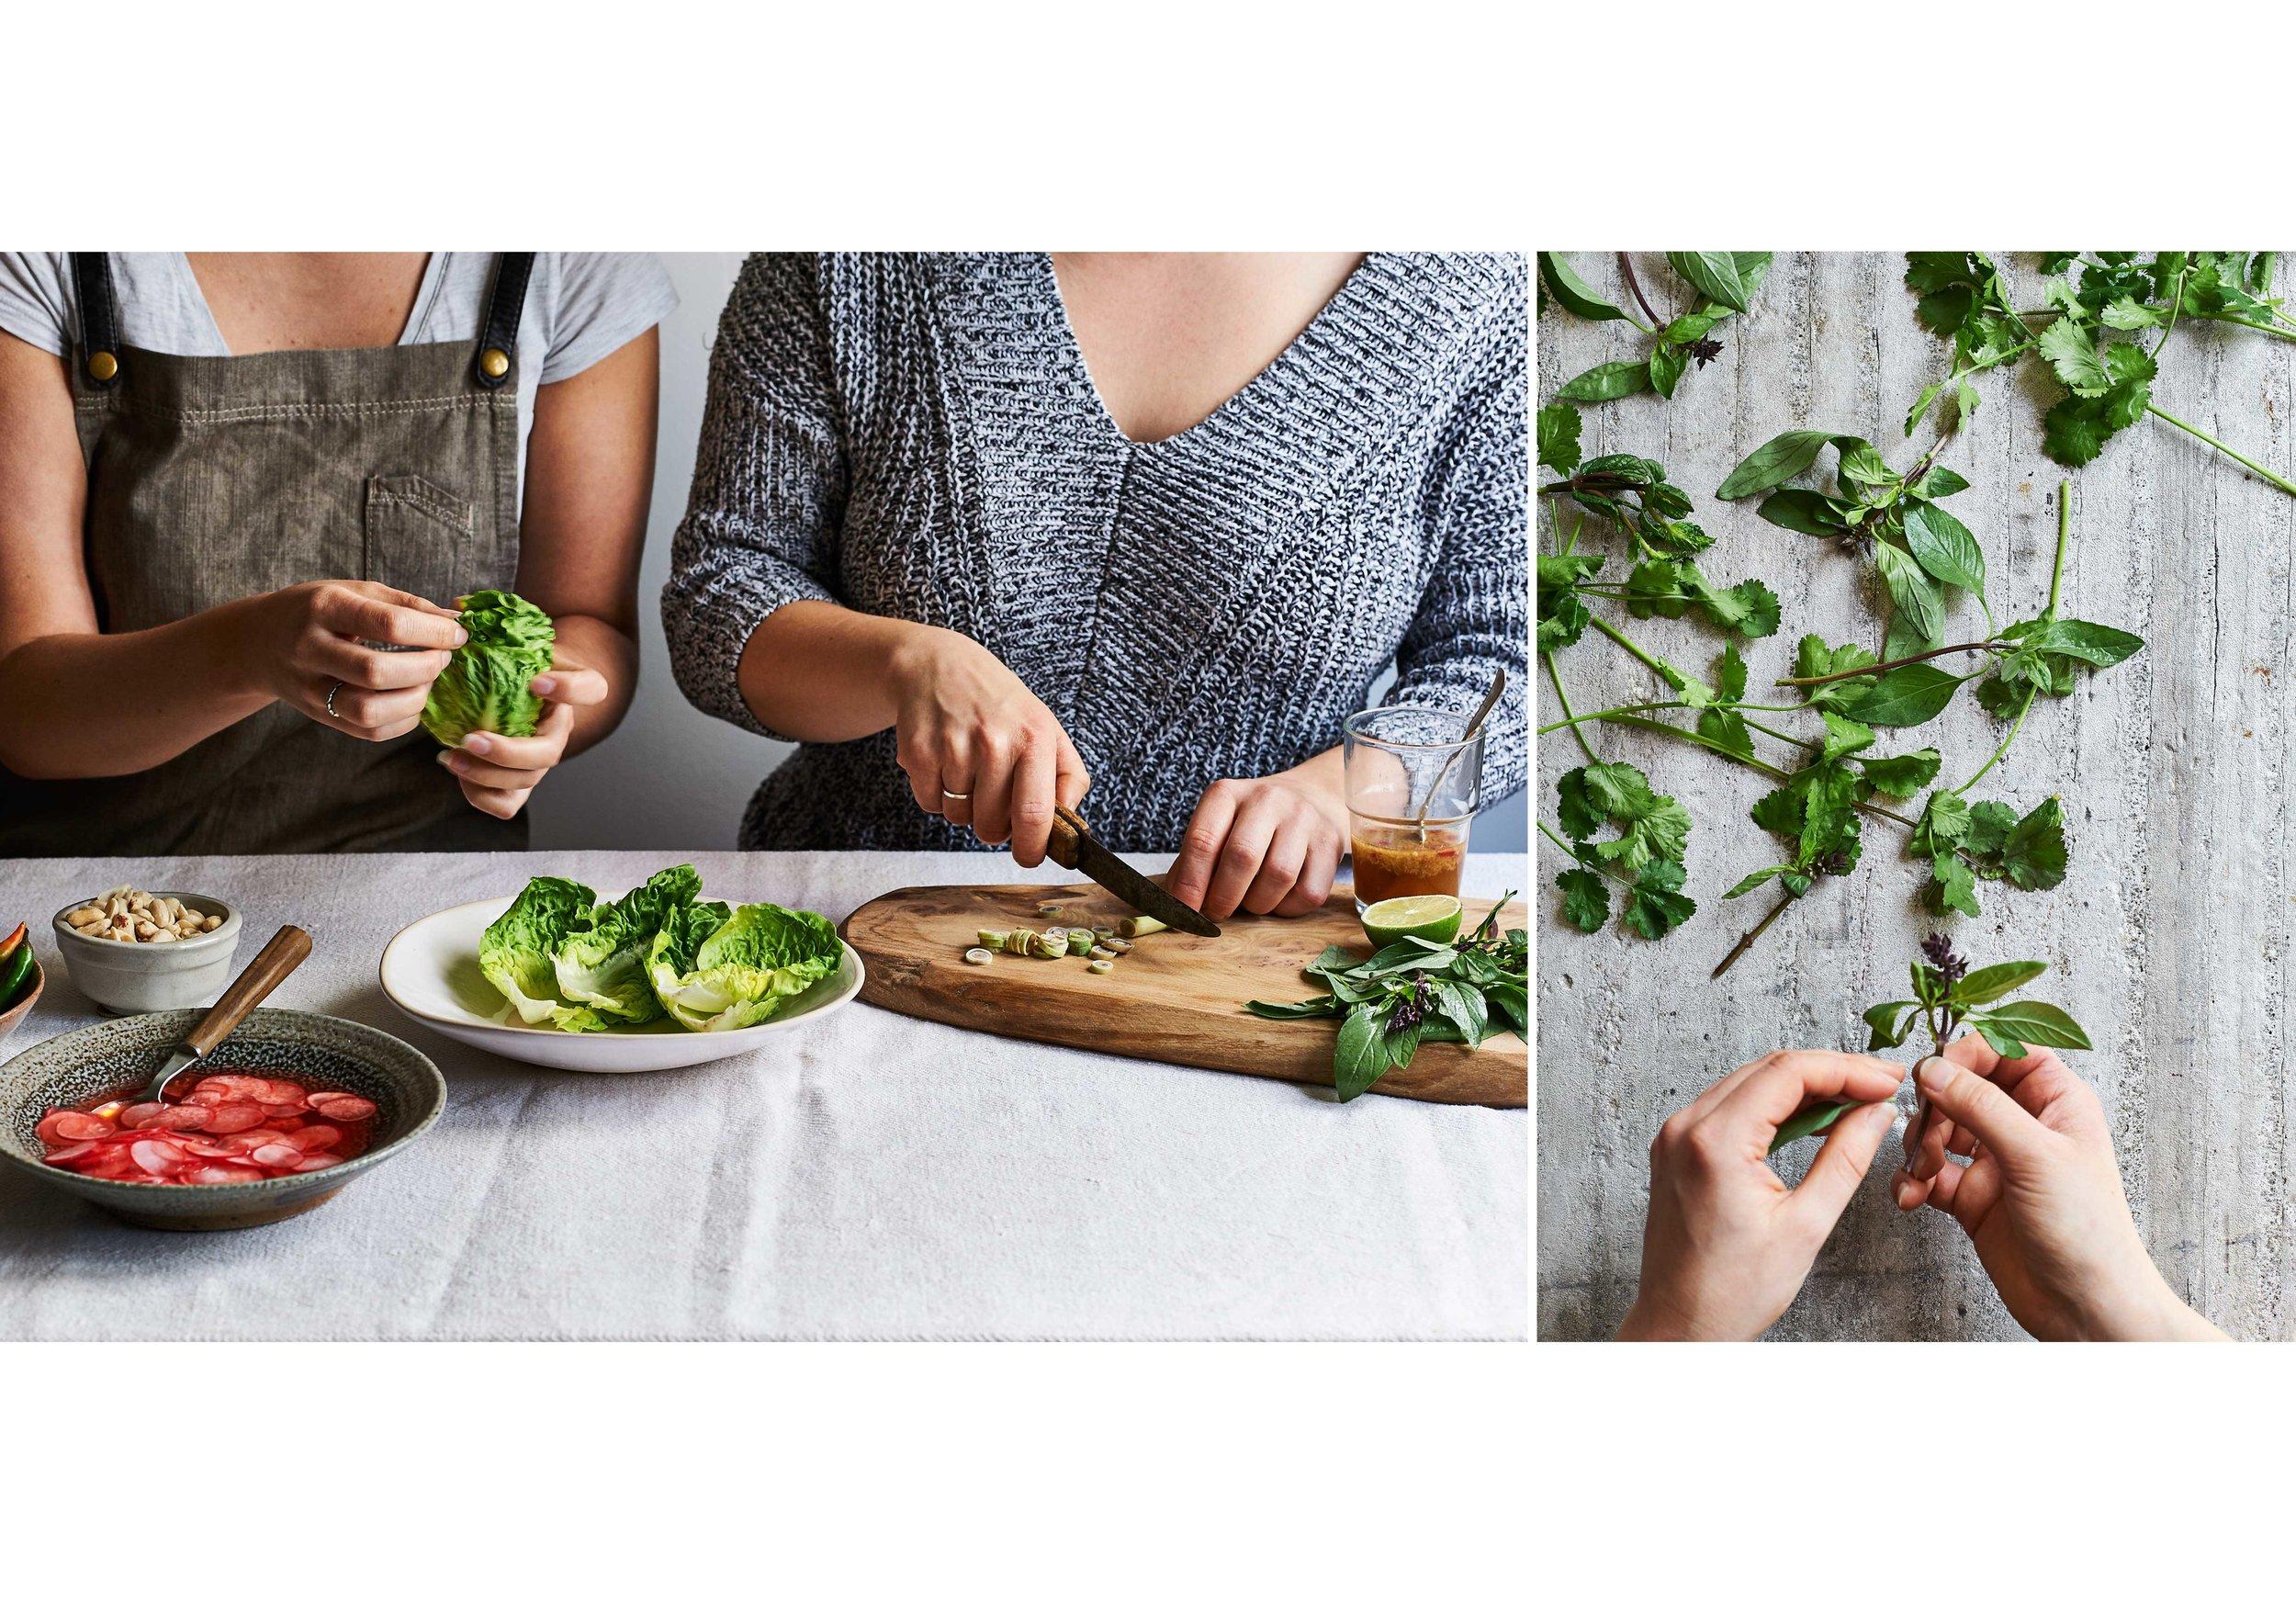 herbs-salad-making.jpg